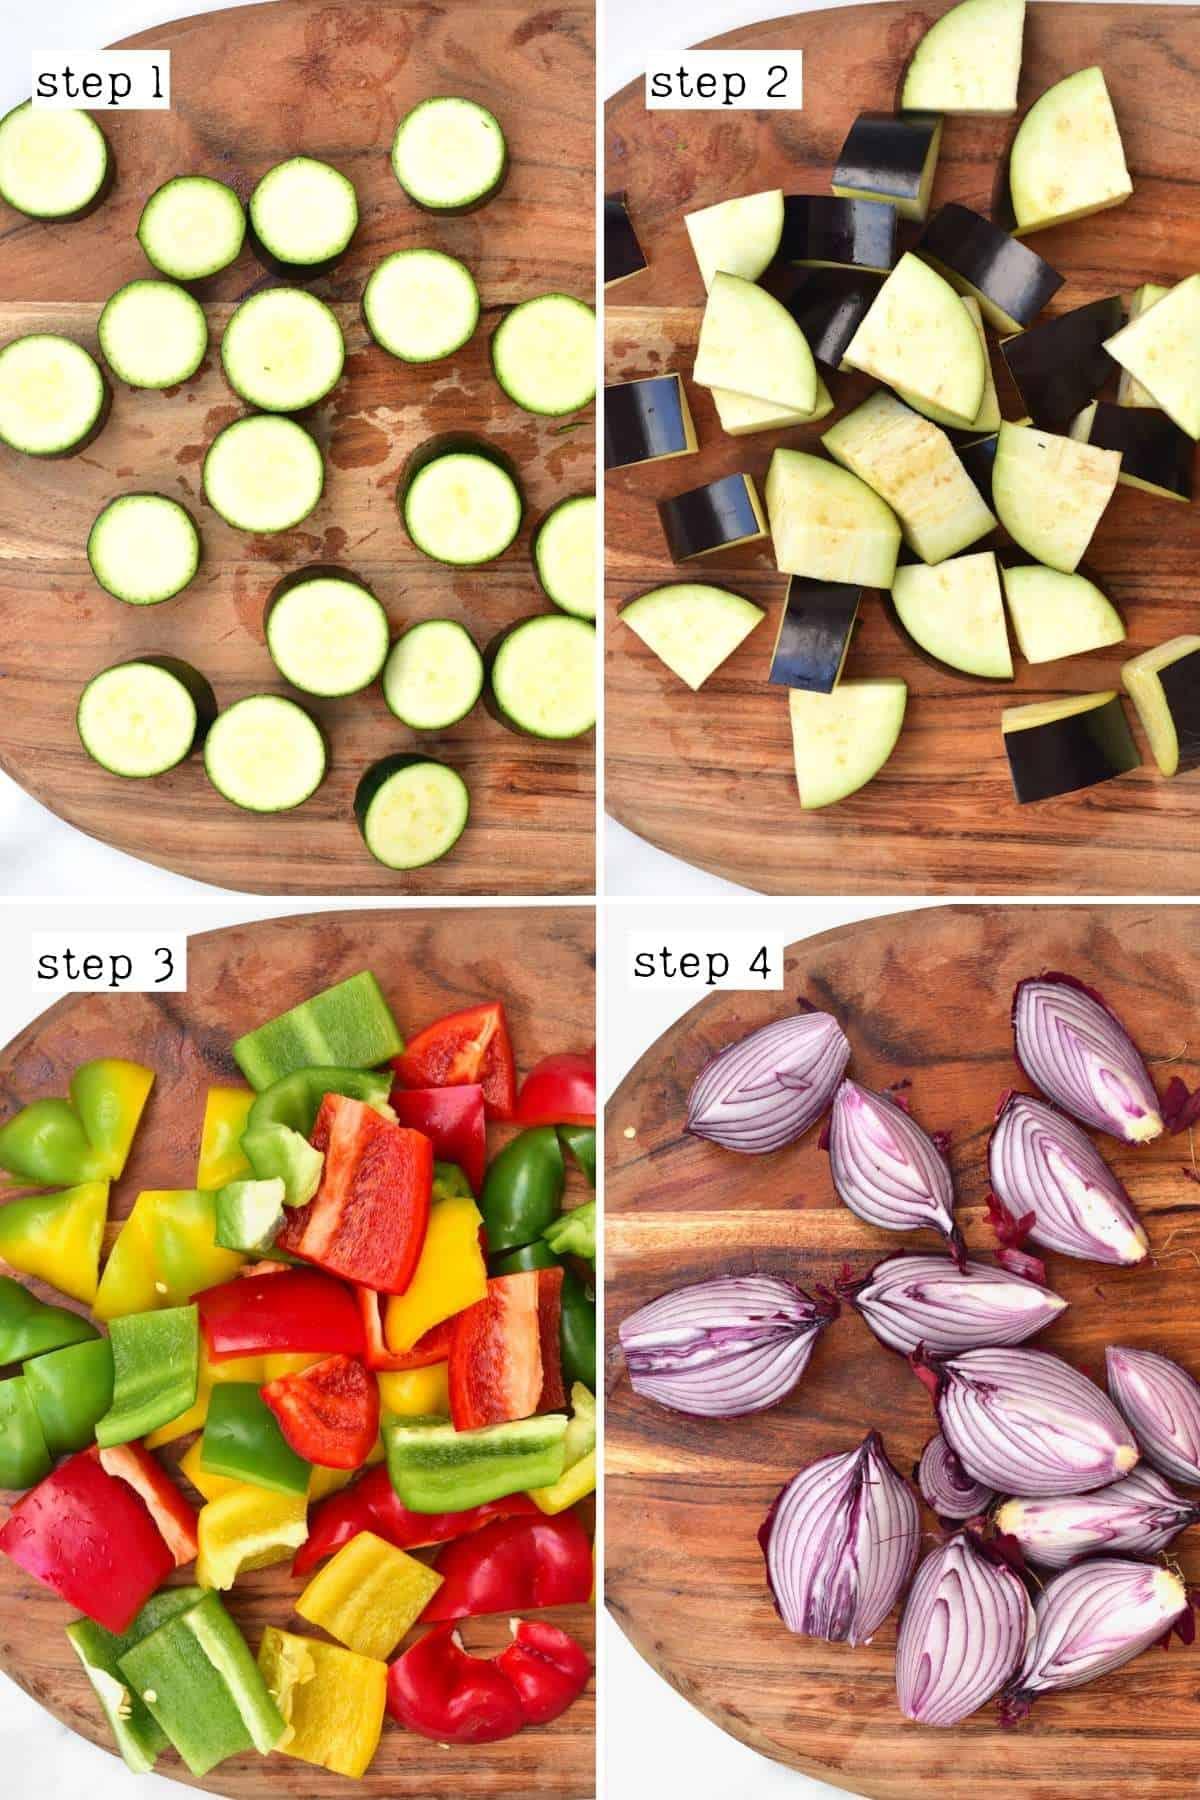 Steps for chopping veggies